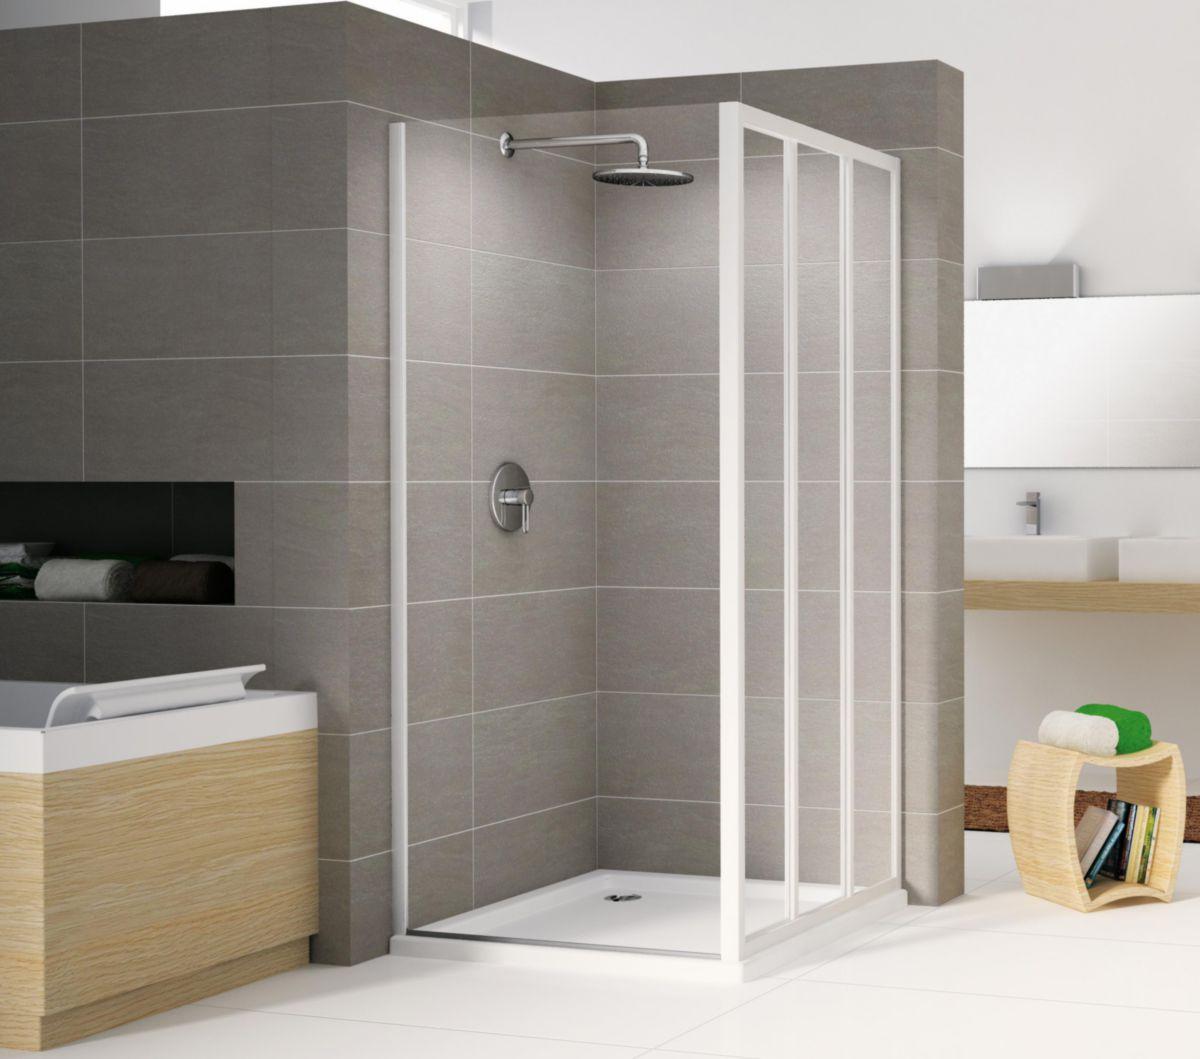 Paroi de douche riviera f 80 78 cm extensible jusqu 39 82 - Pose porte douche verre ...